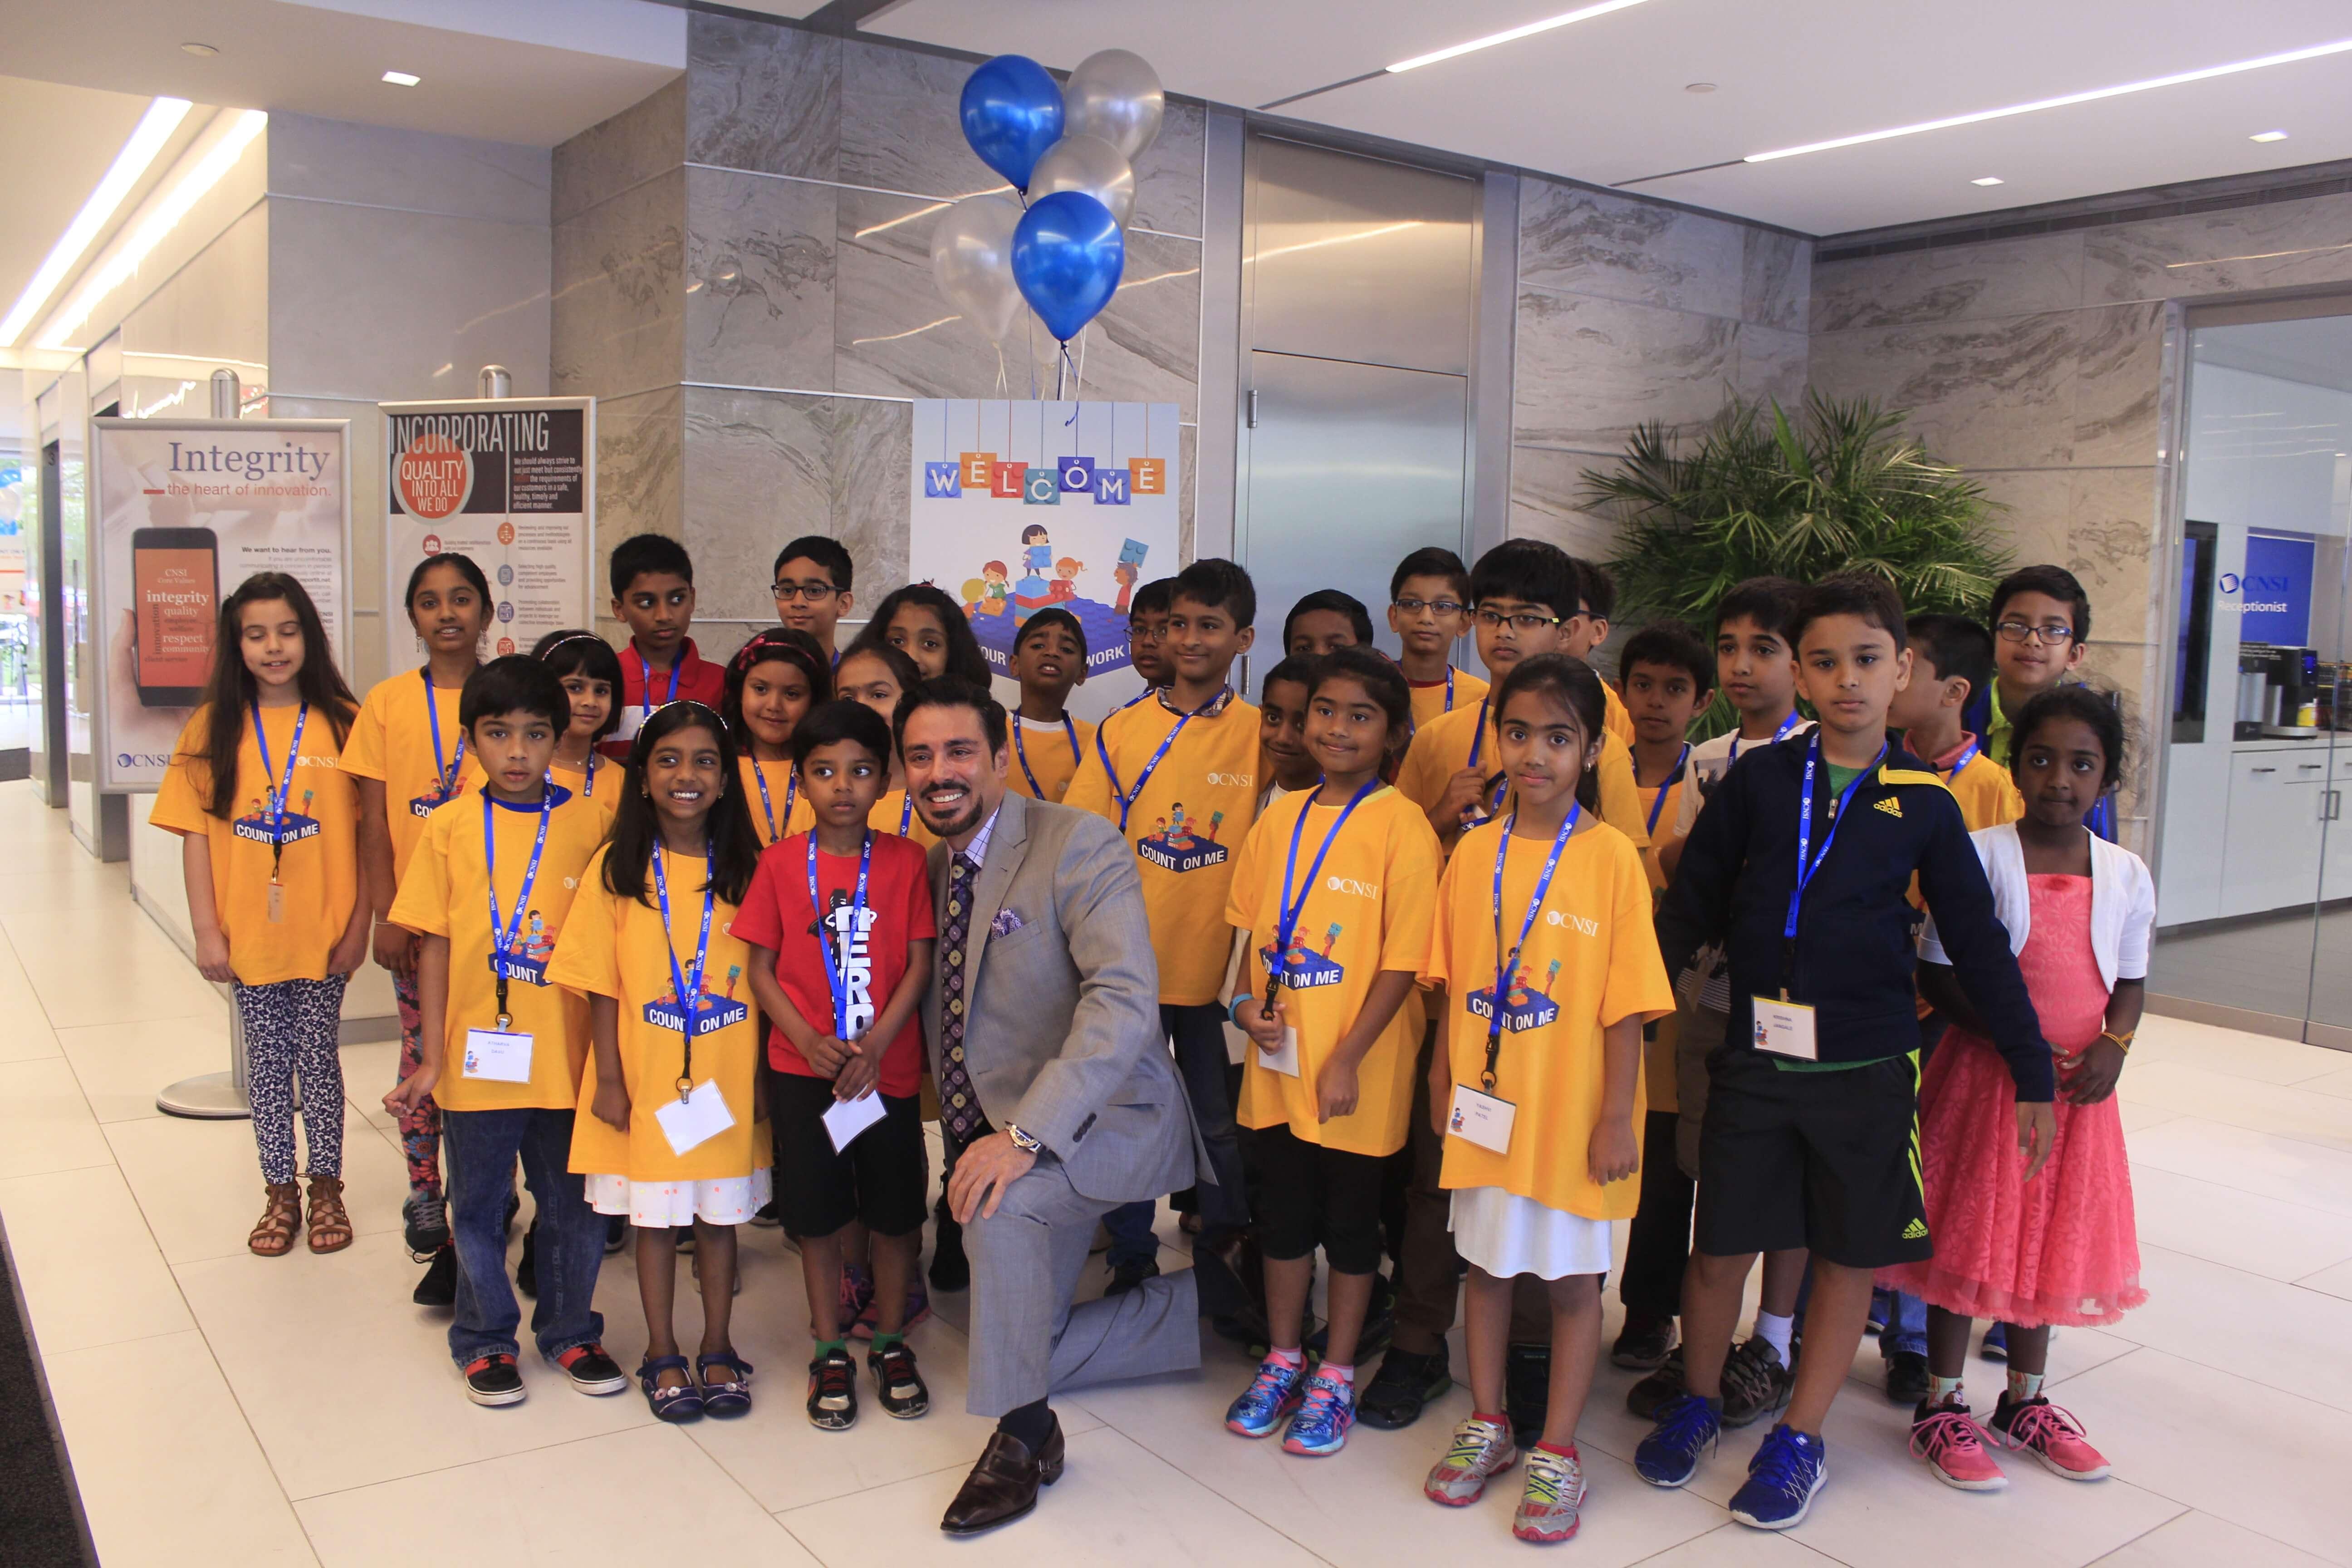 CNSI Counts on Kids Day